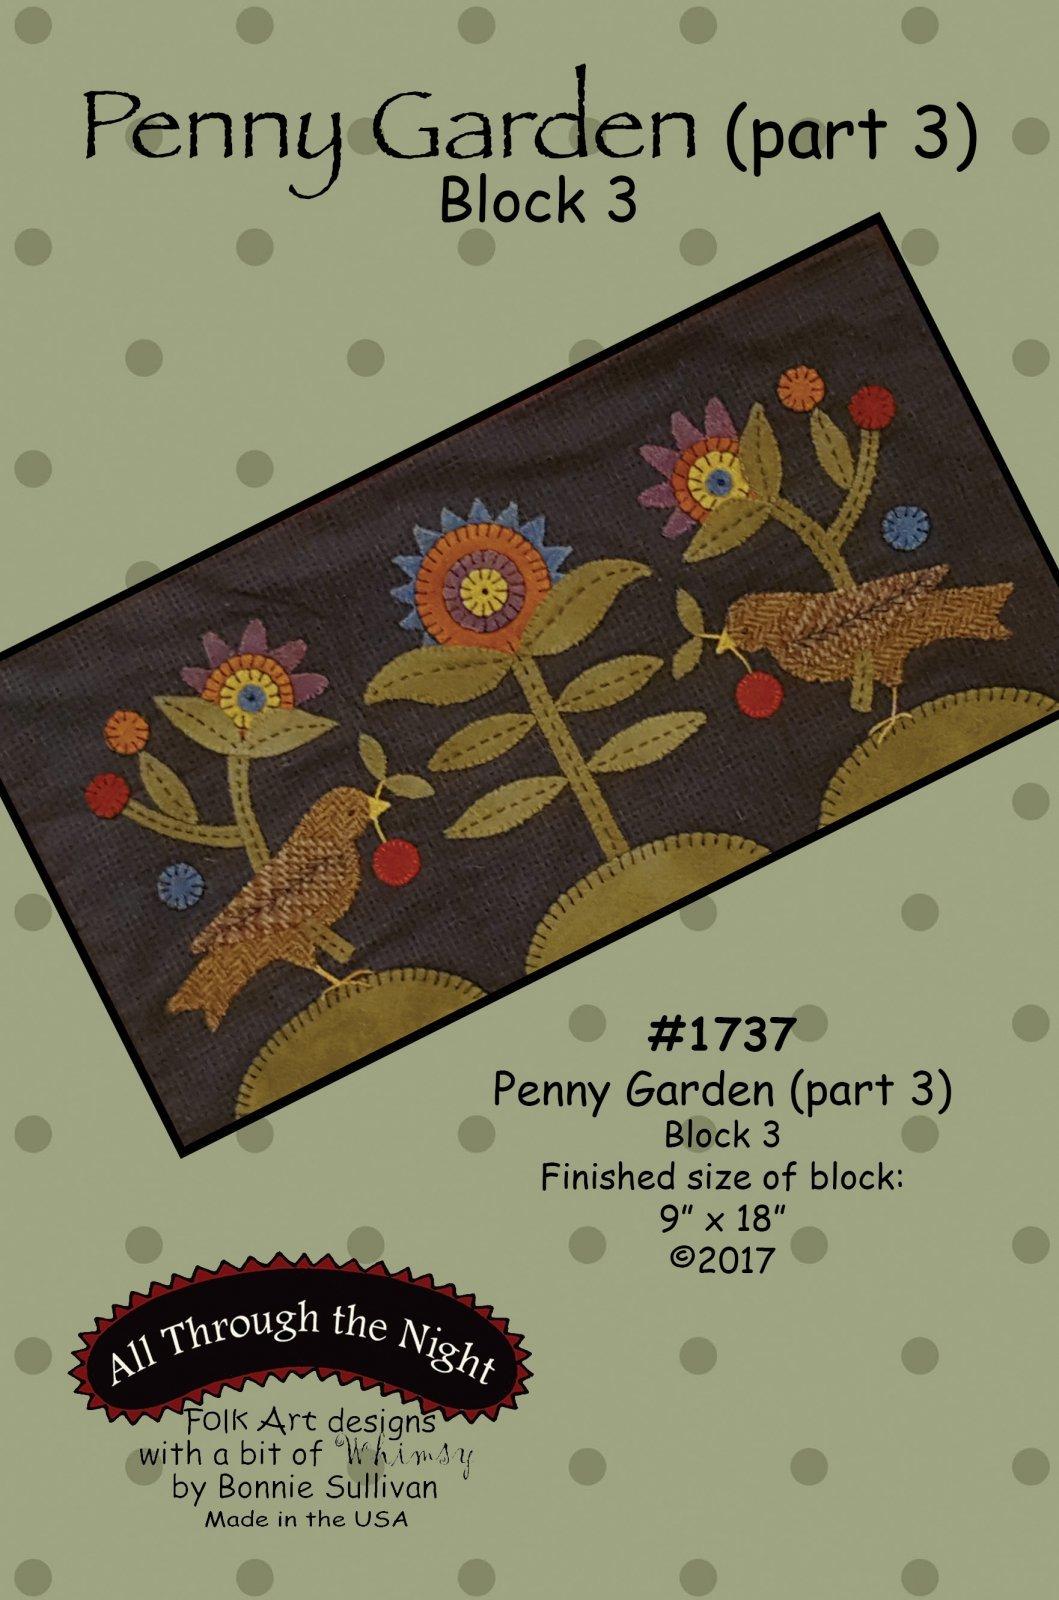 All Through The Night ATN1804 Winter Friends Banner Pattern